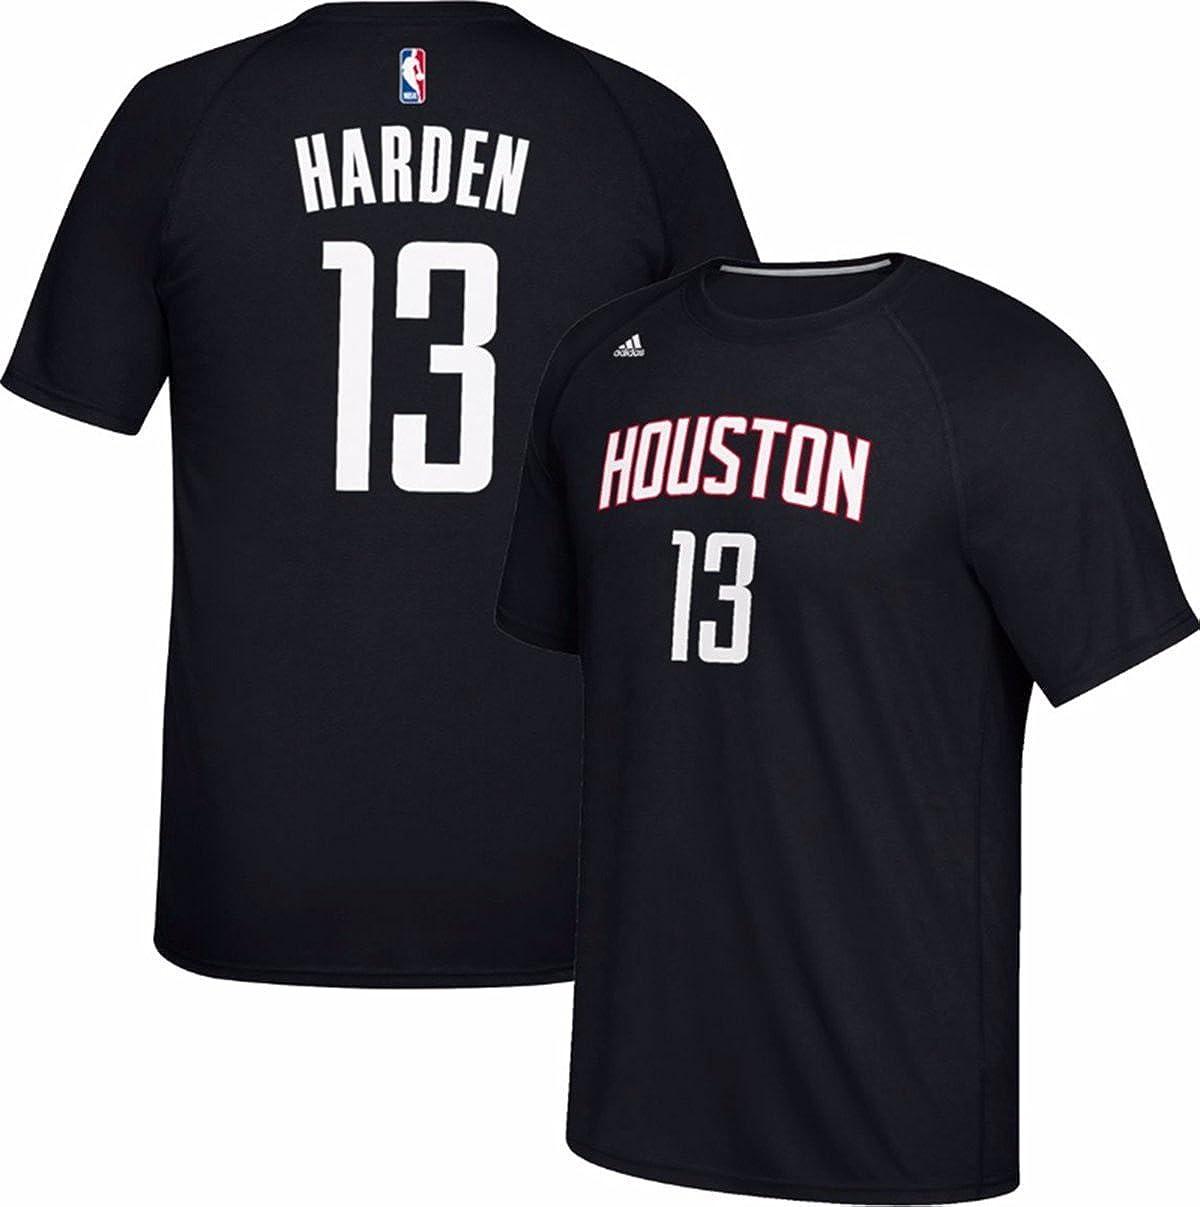 501a3d536 Amazon.com  James Harden Houston Rockets  13 Adidas Black Climalite Name   Number  Kids T-Shirt  Clothing